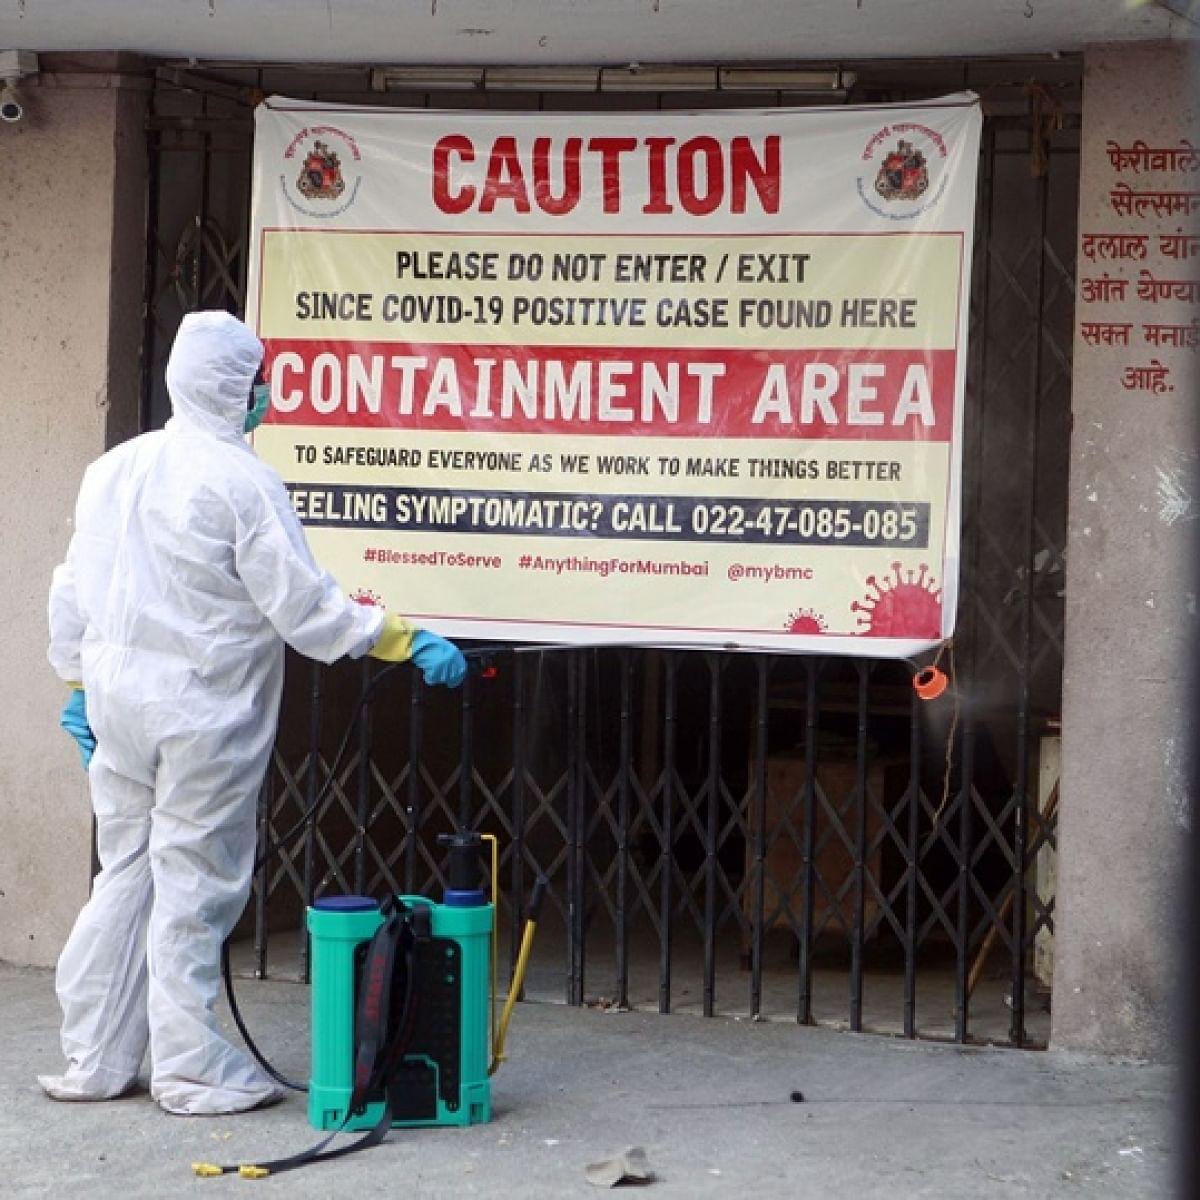 Despite rise in COVID-19 cases, number of containment zones in Navi Mumbai shrink